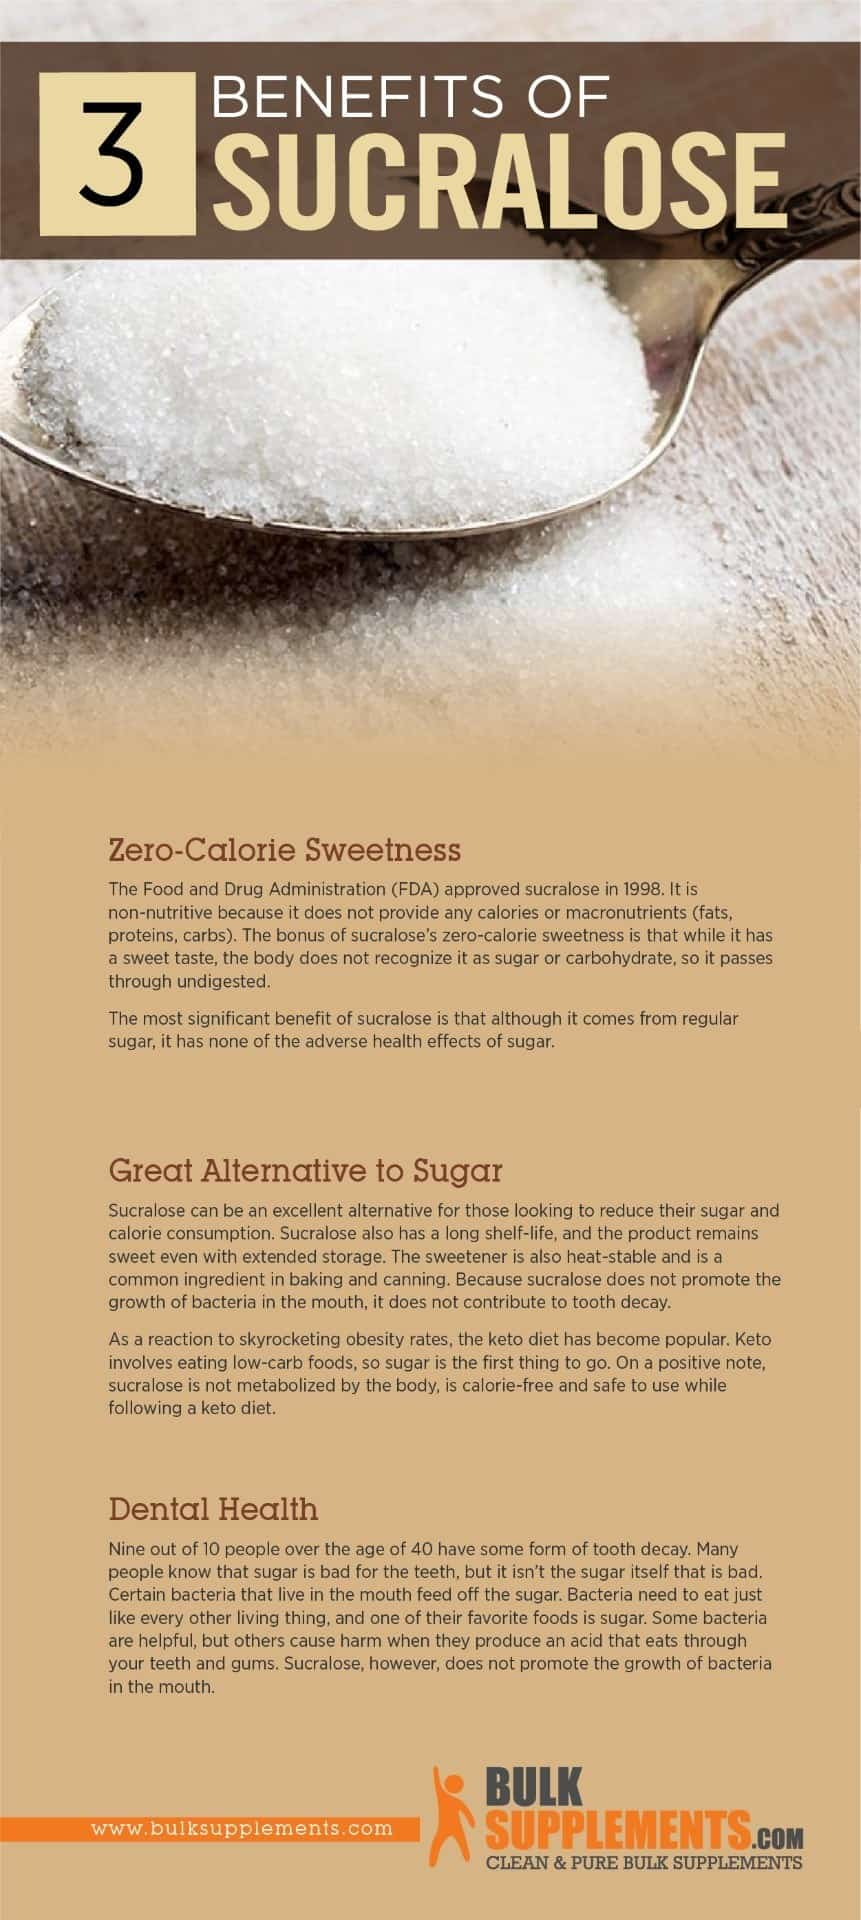 Benefits of Sucralose Sweetener